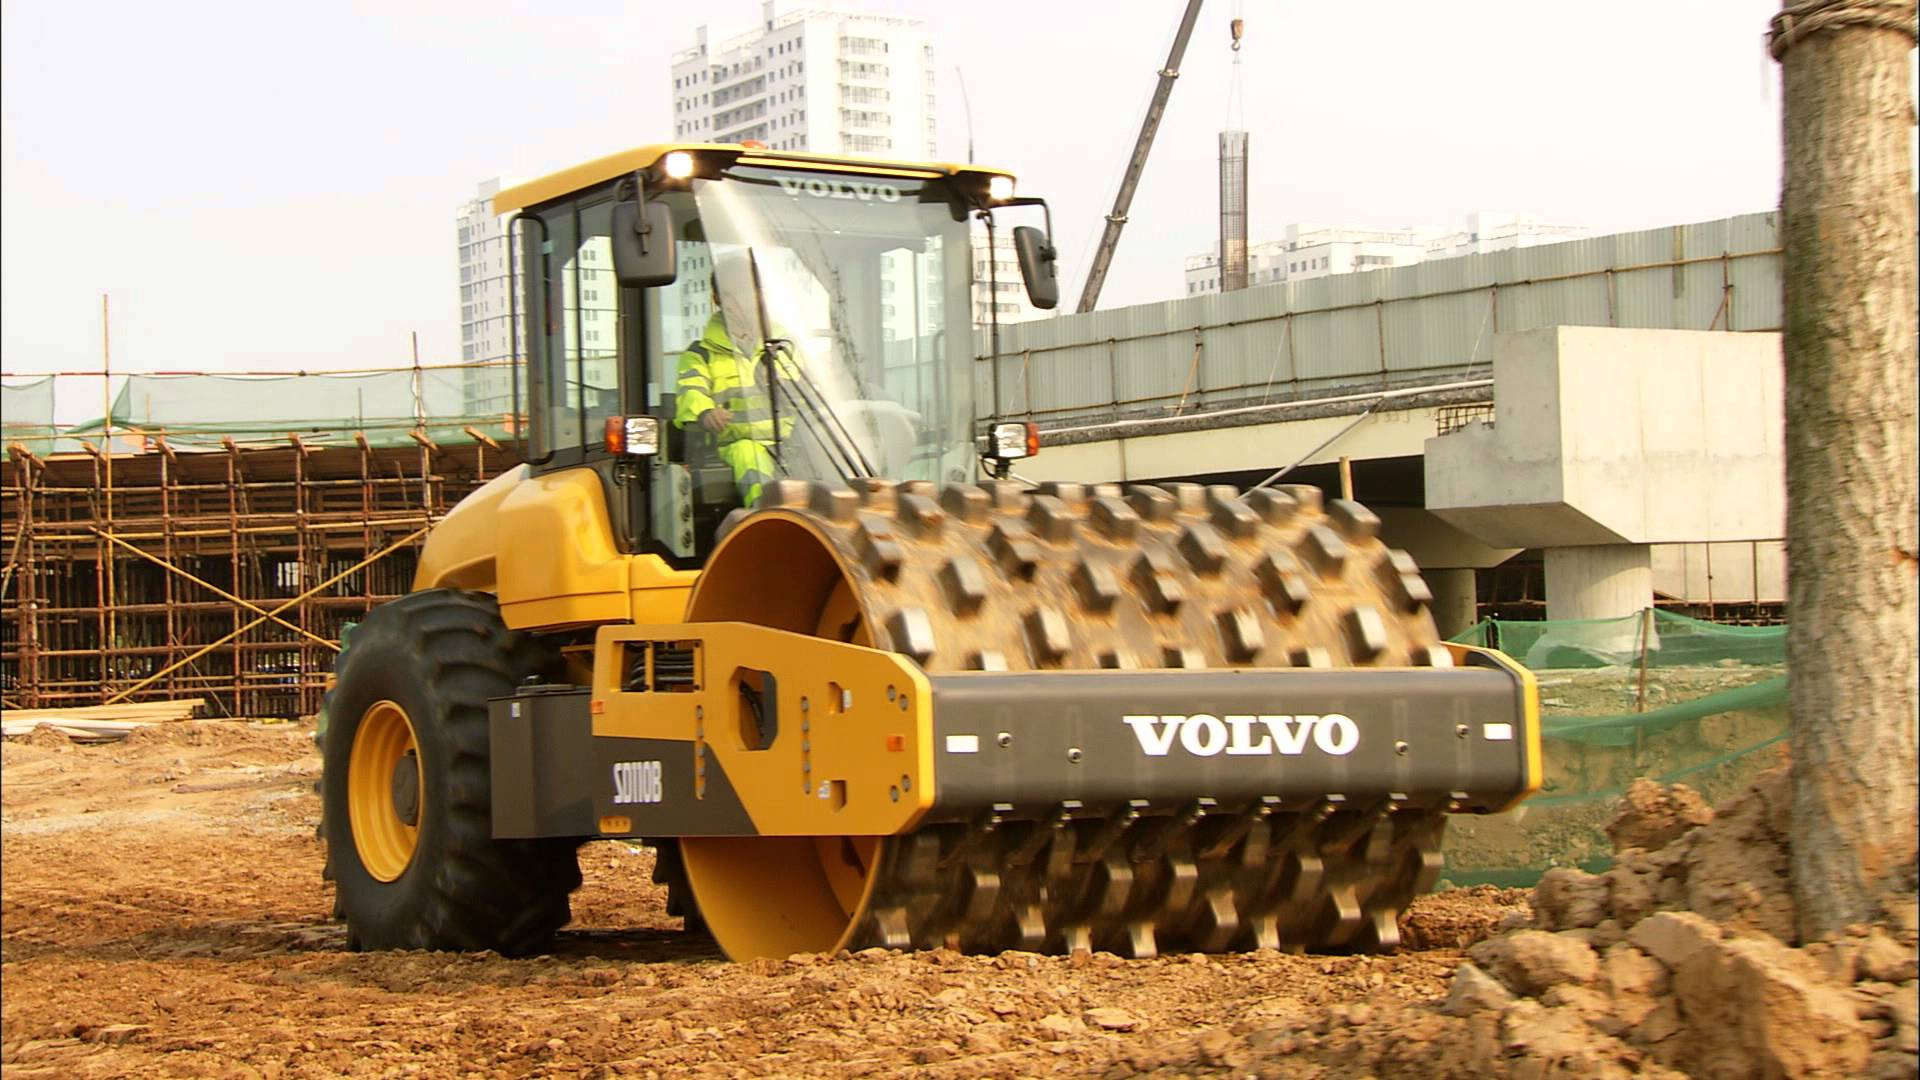 Volvo SD110B soil compactor - Operator environment - YouTube